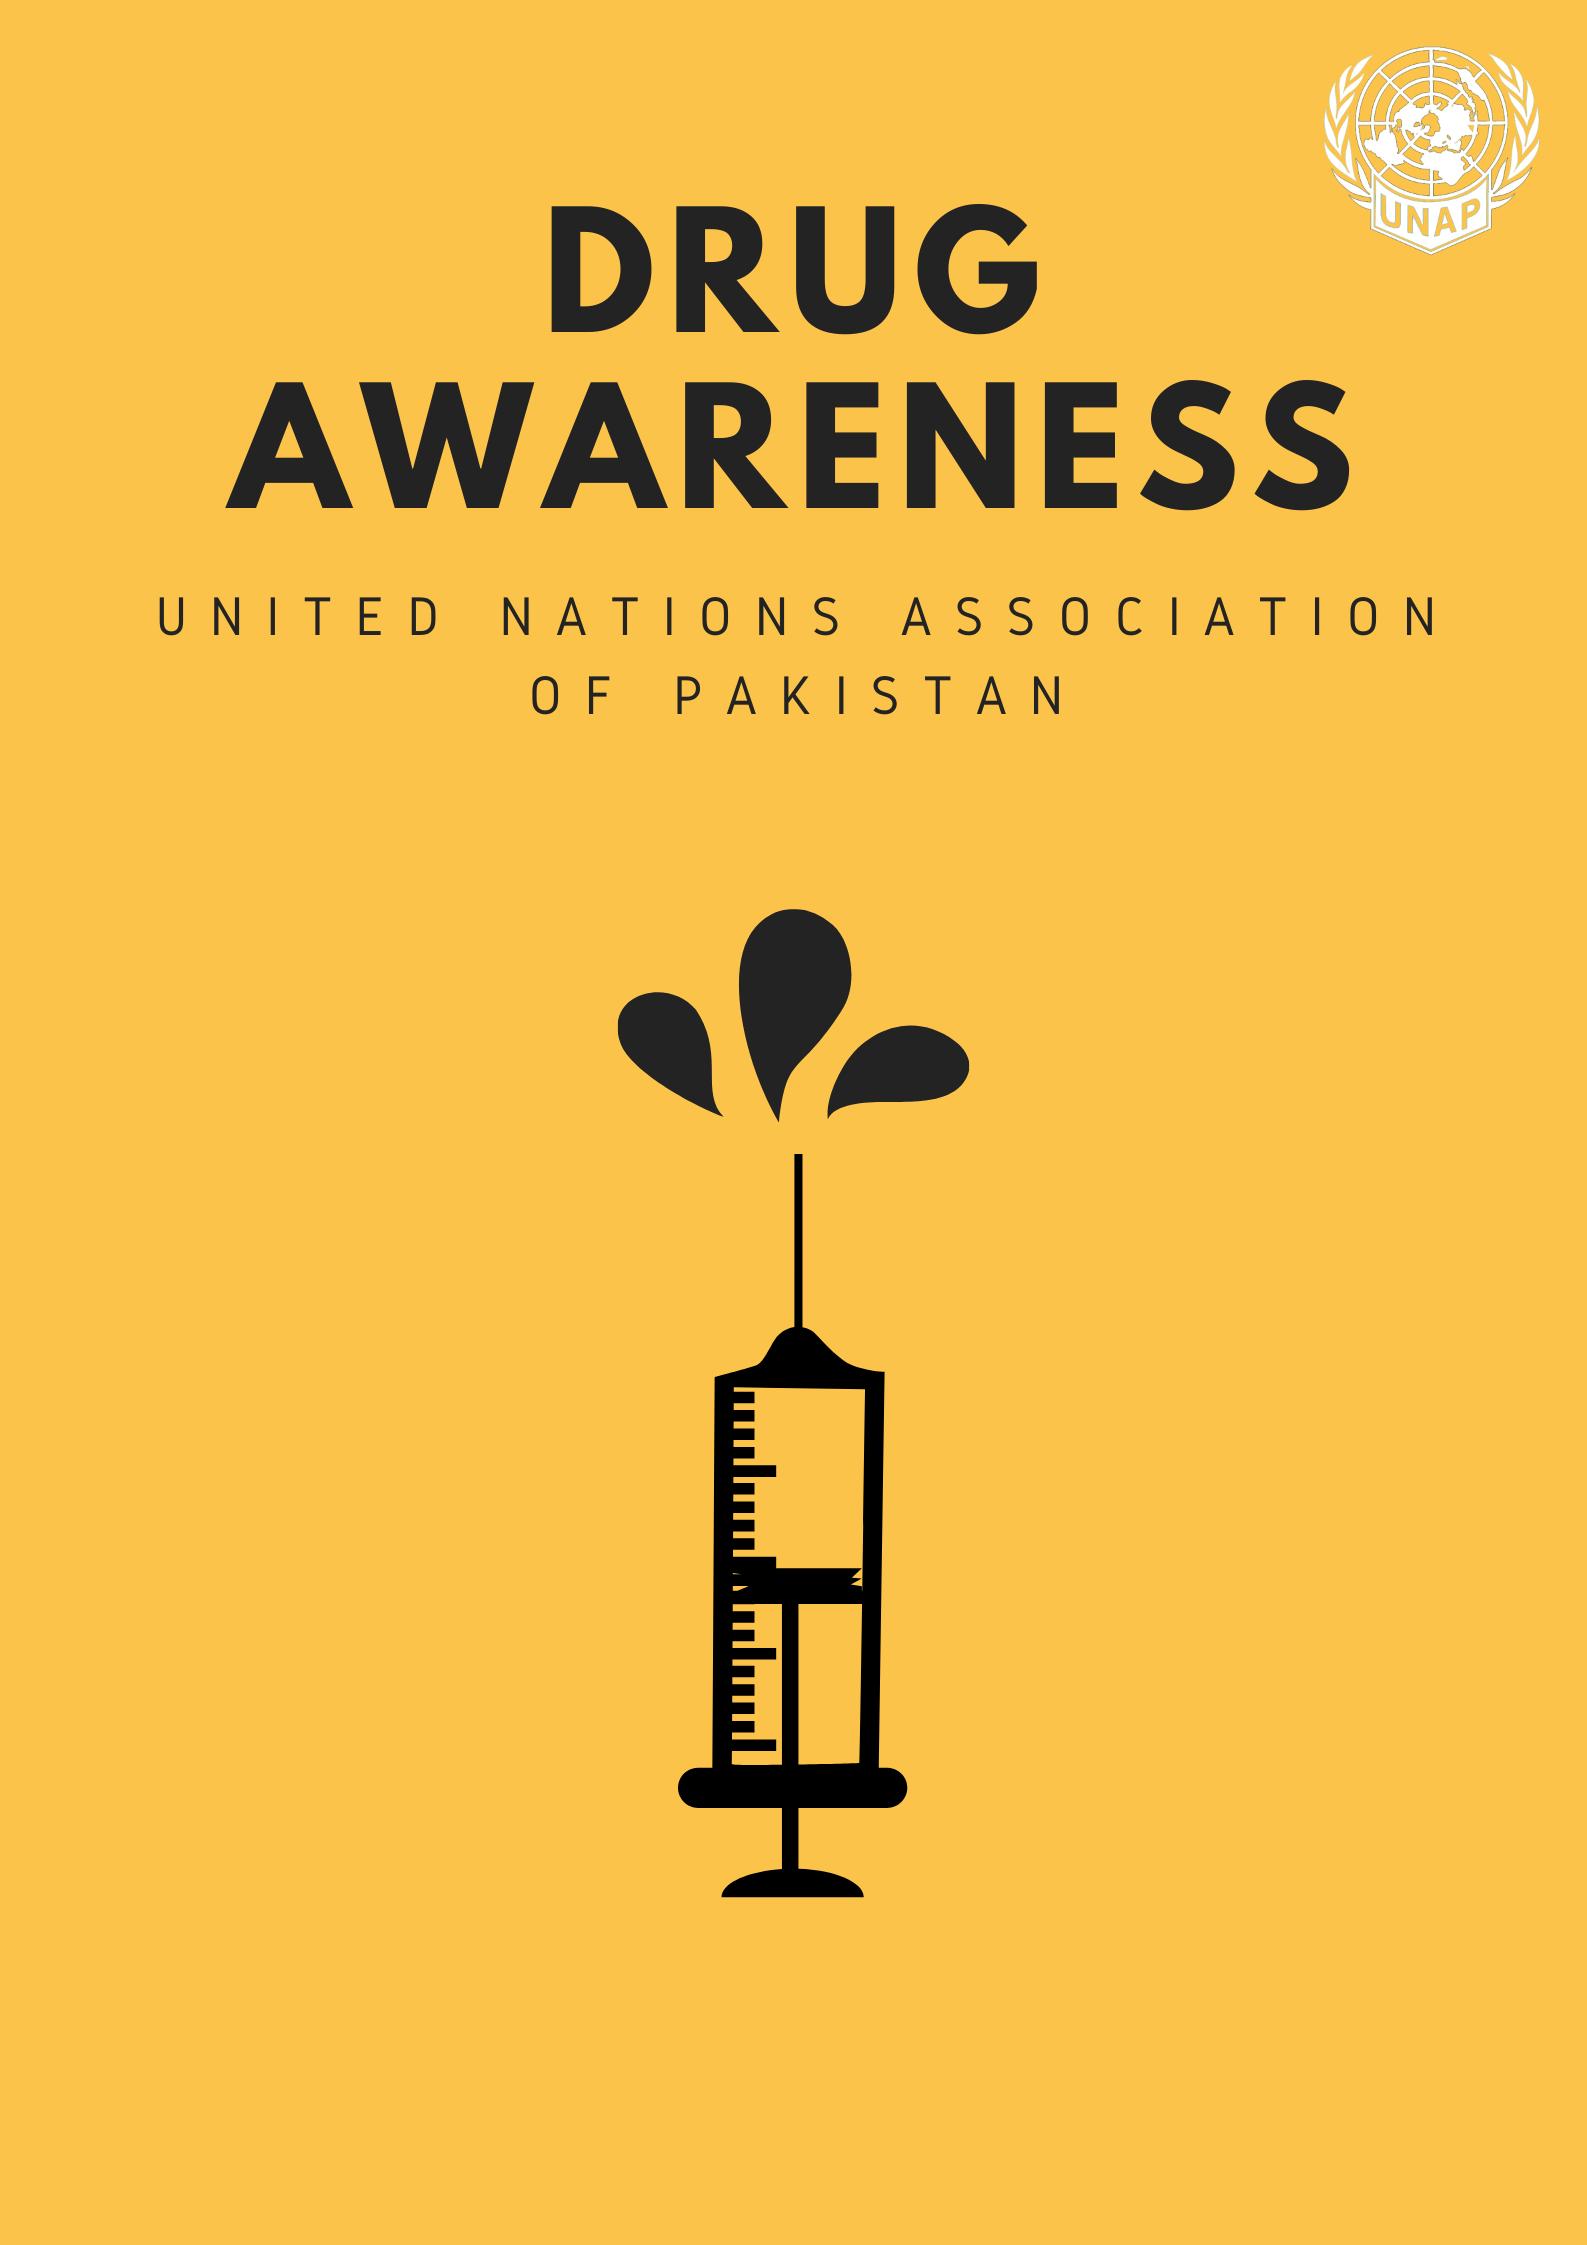 Drug Awareness Campaign